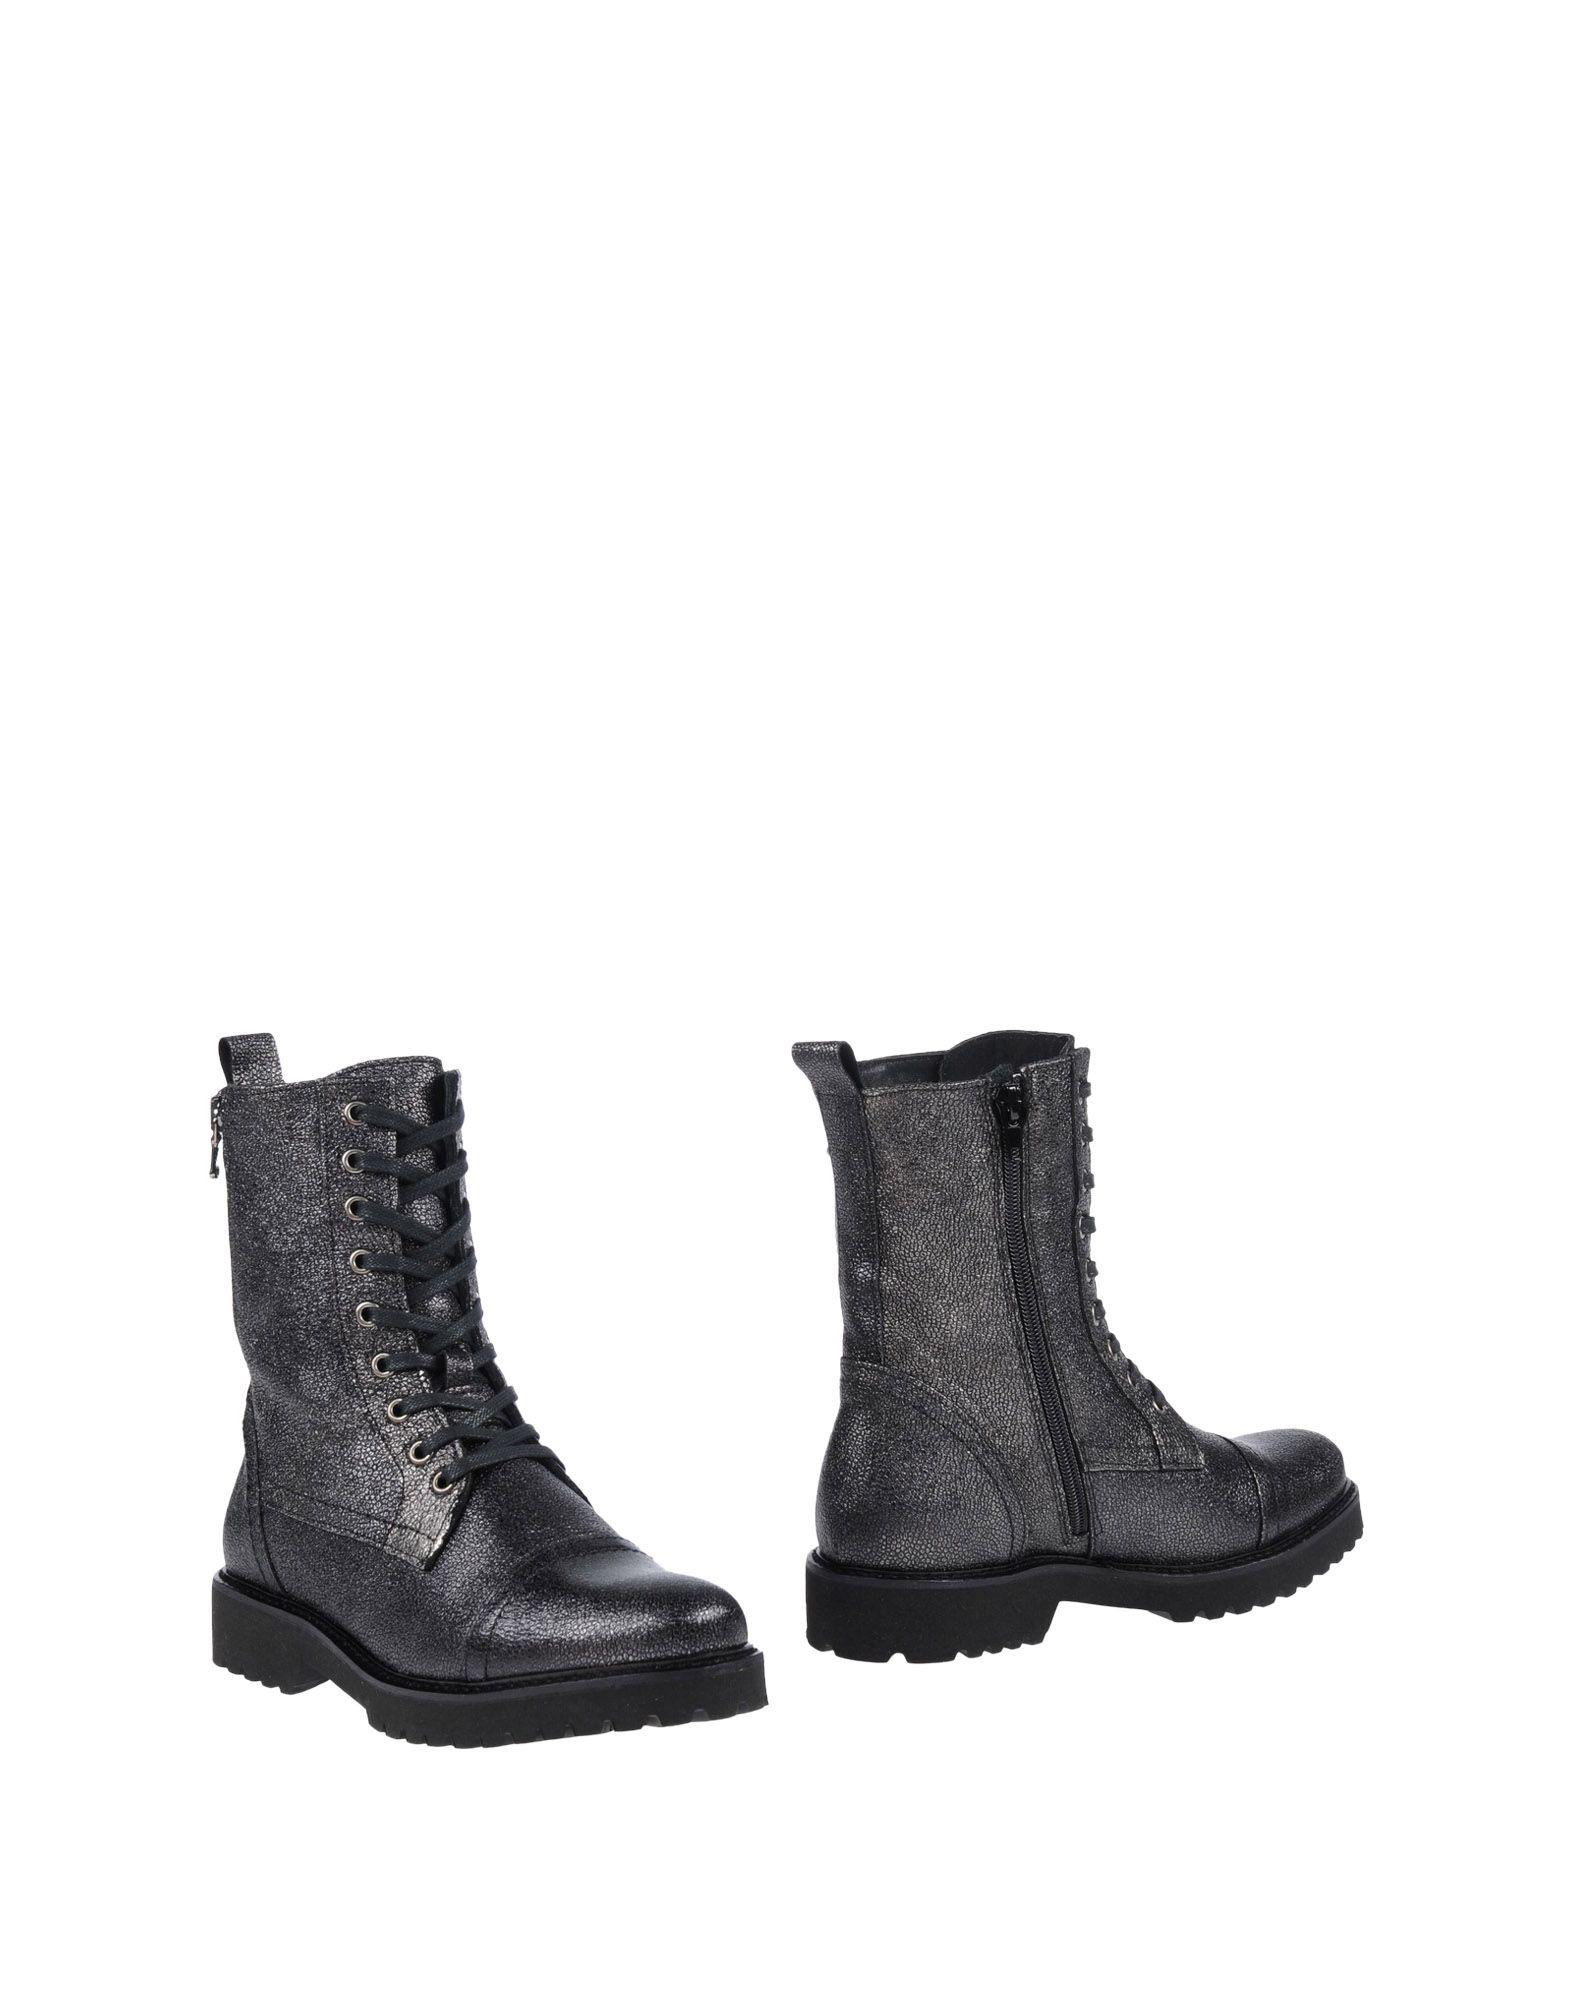 Stilvolle Gatte billige Schuhe Le Gatte Stilvolle Stiefelette Damen  11454744IQ 23e40a